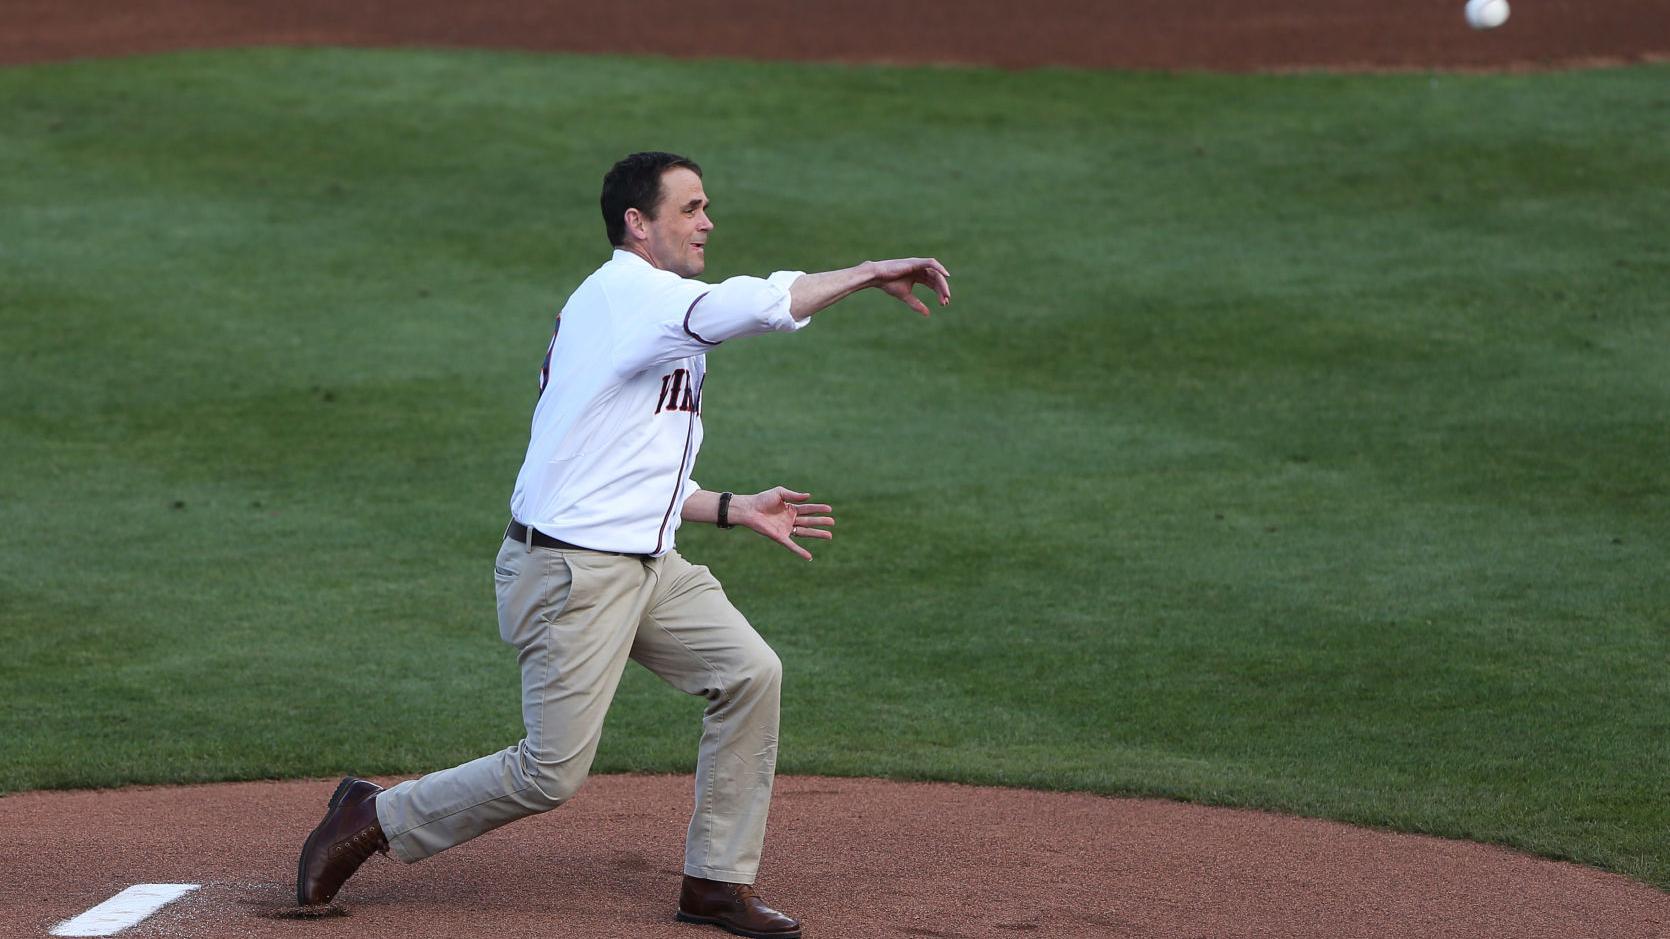 Photos: Virginia baseball team hosts VCU